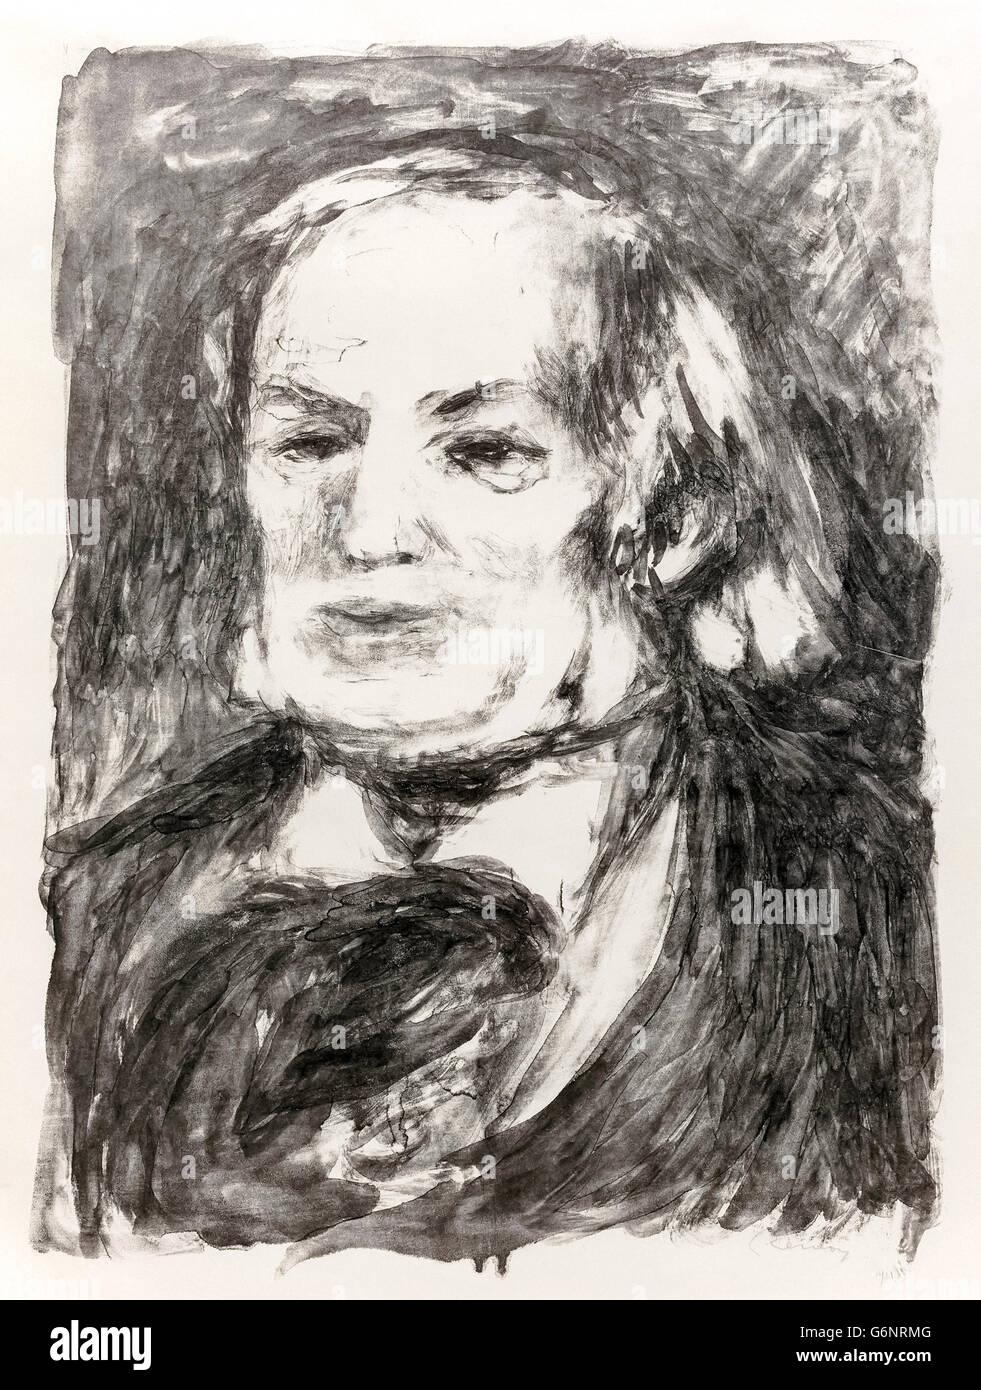 Richard Wagner (1813-1883) German composer, portrait by Pierre-Auguste Renoir (1841-1919) circa 1882. See description - Stock Image